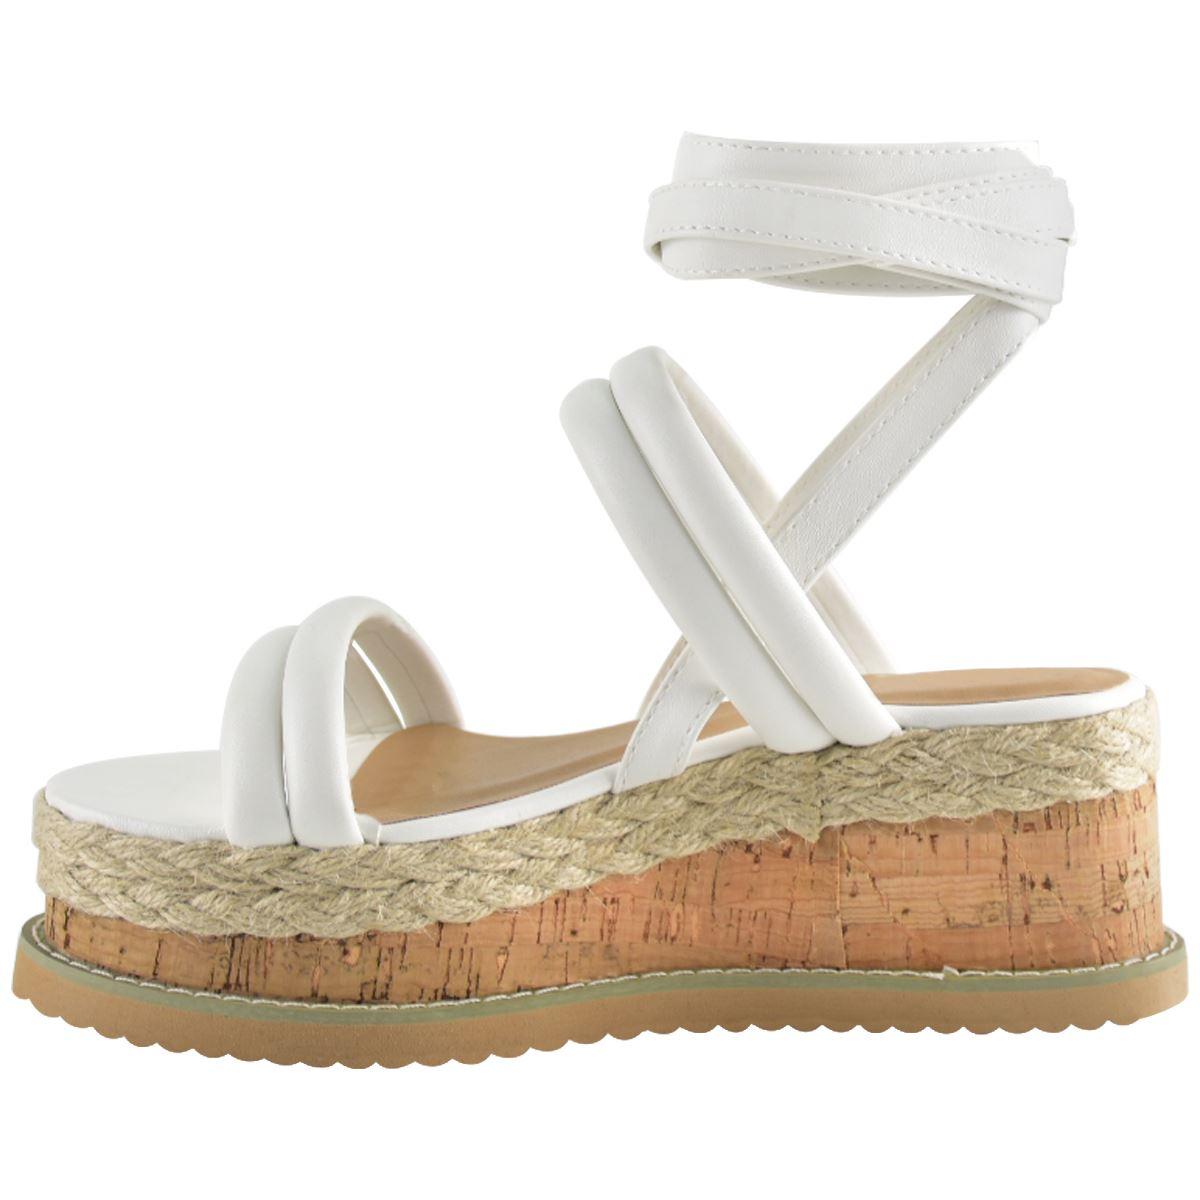 d0b75b605ea Womens Summer Espadrilles Flatforms Strappy Sandals Wedge Platform ...